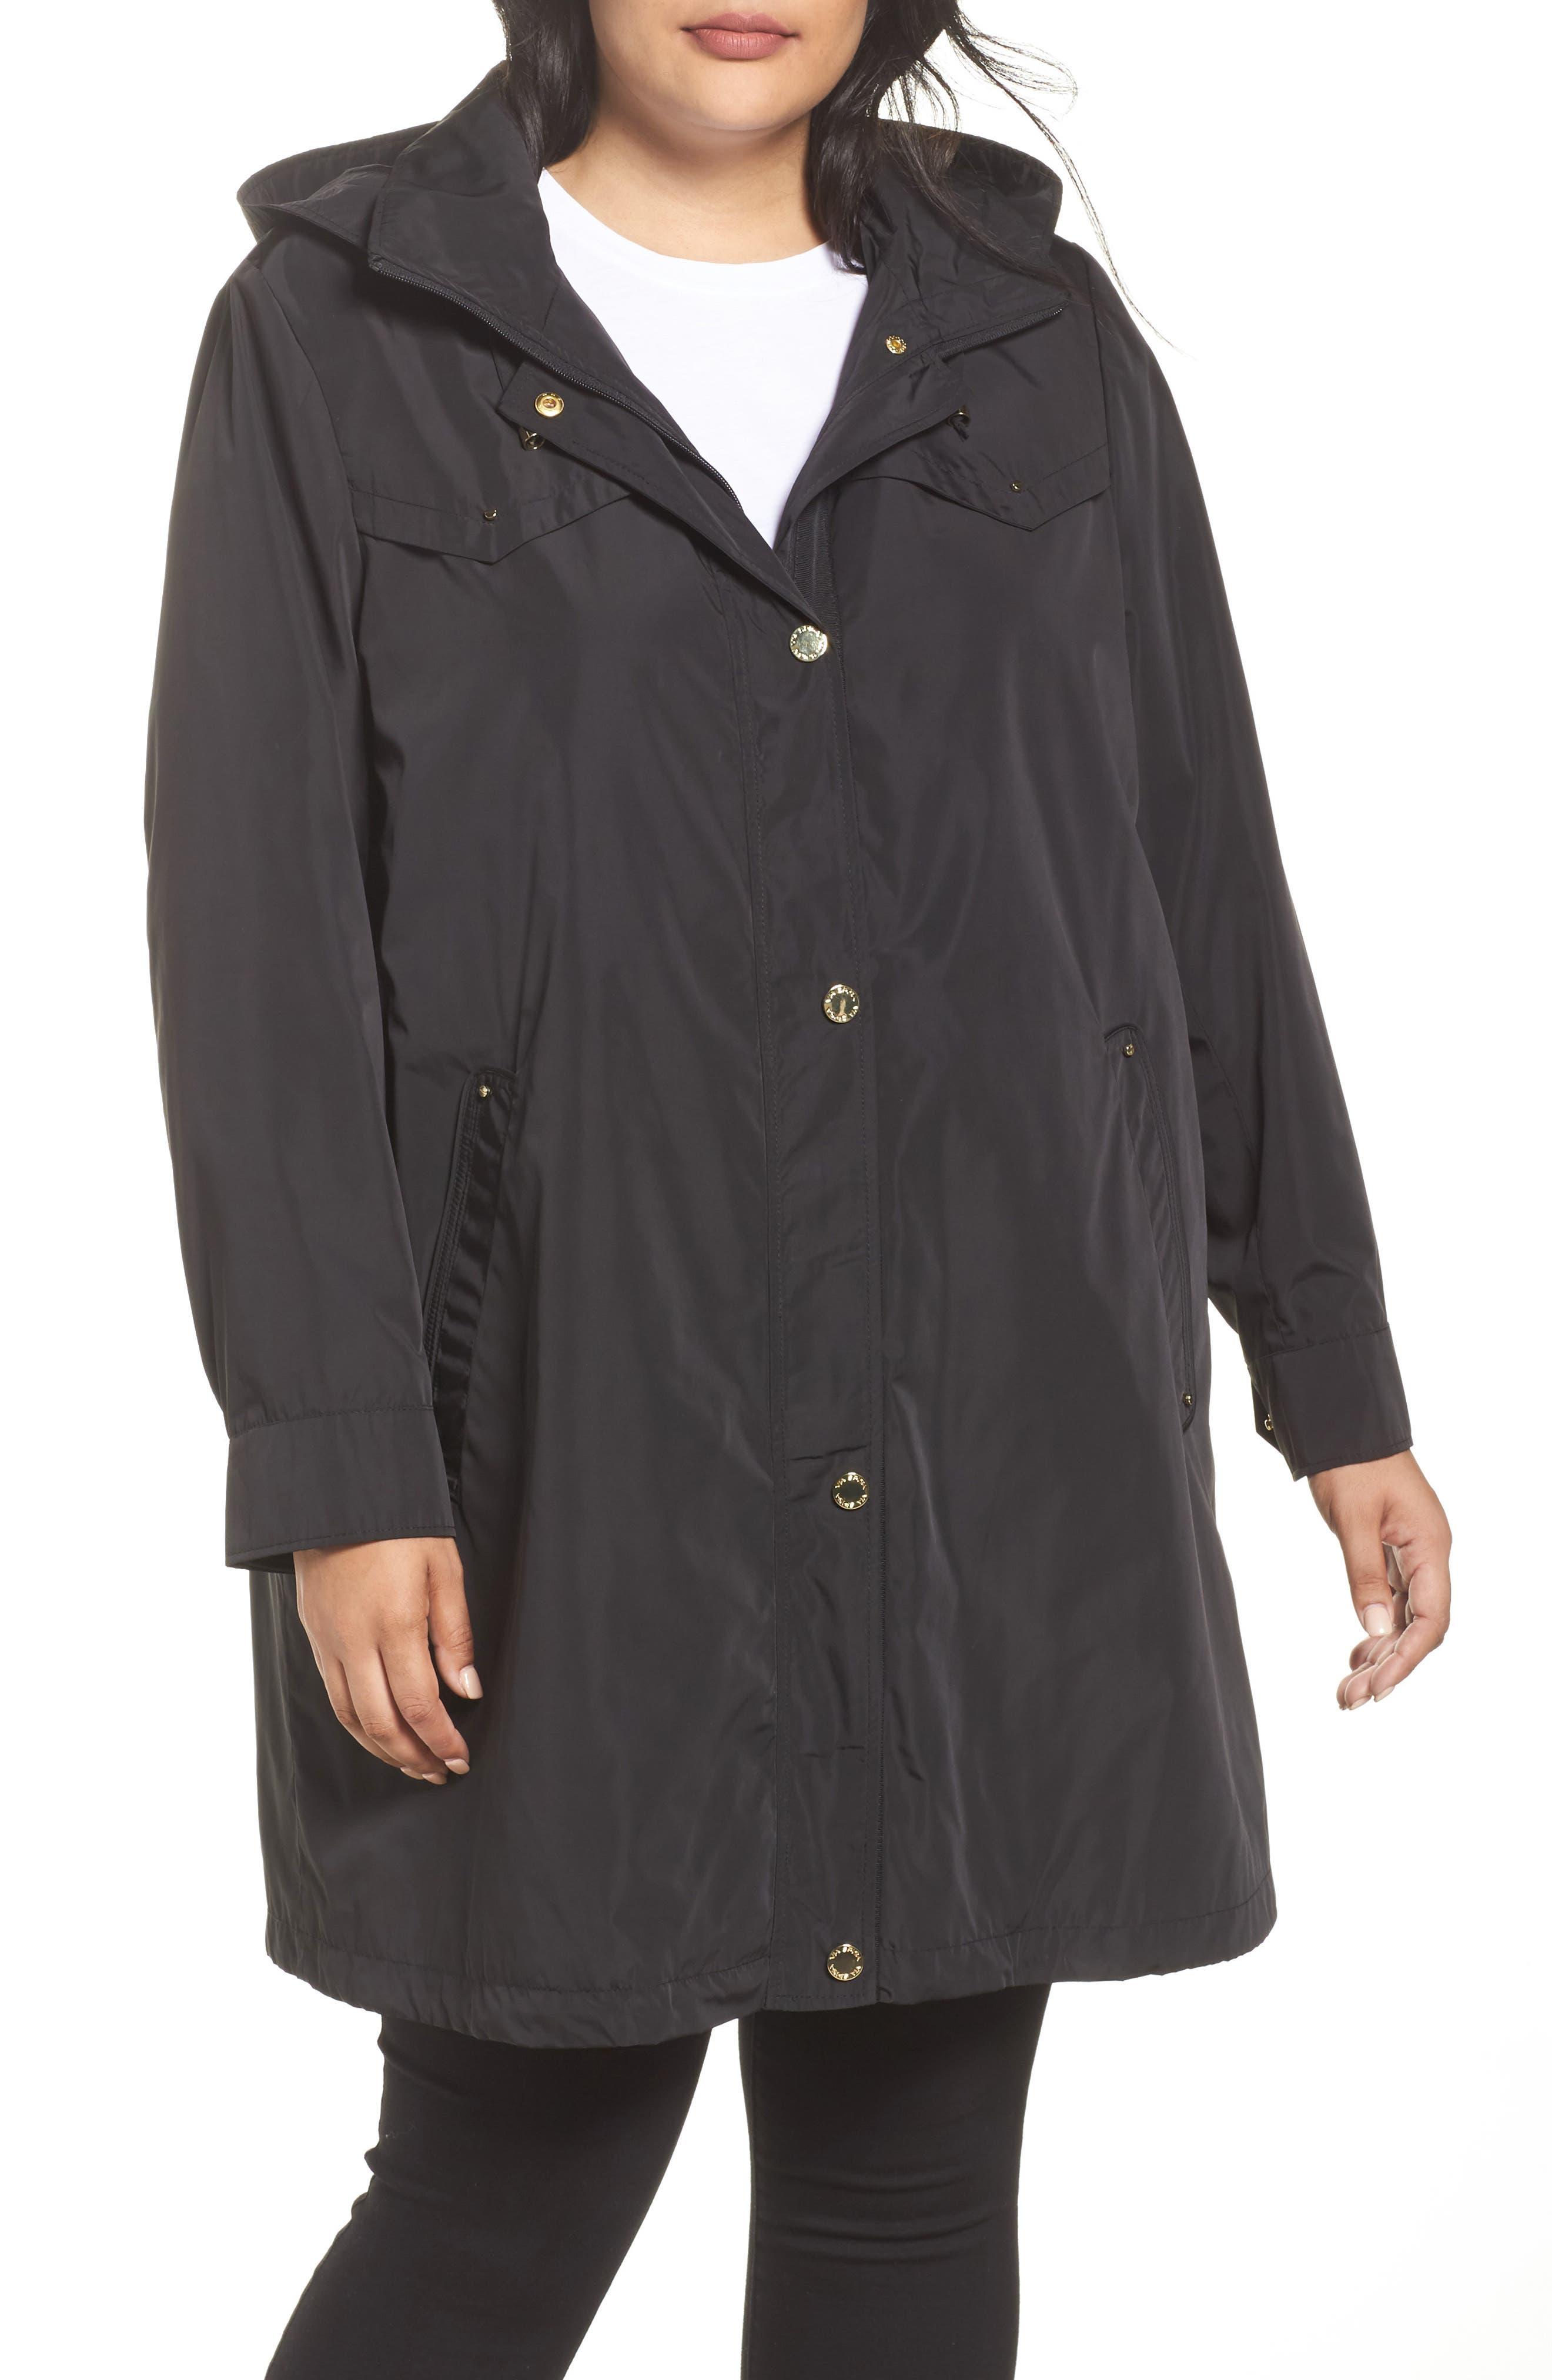 Alternate Image 1 Selected - Via Spiga Hooded Packable Utility Coat (Plus Size)